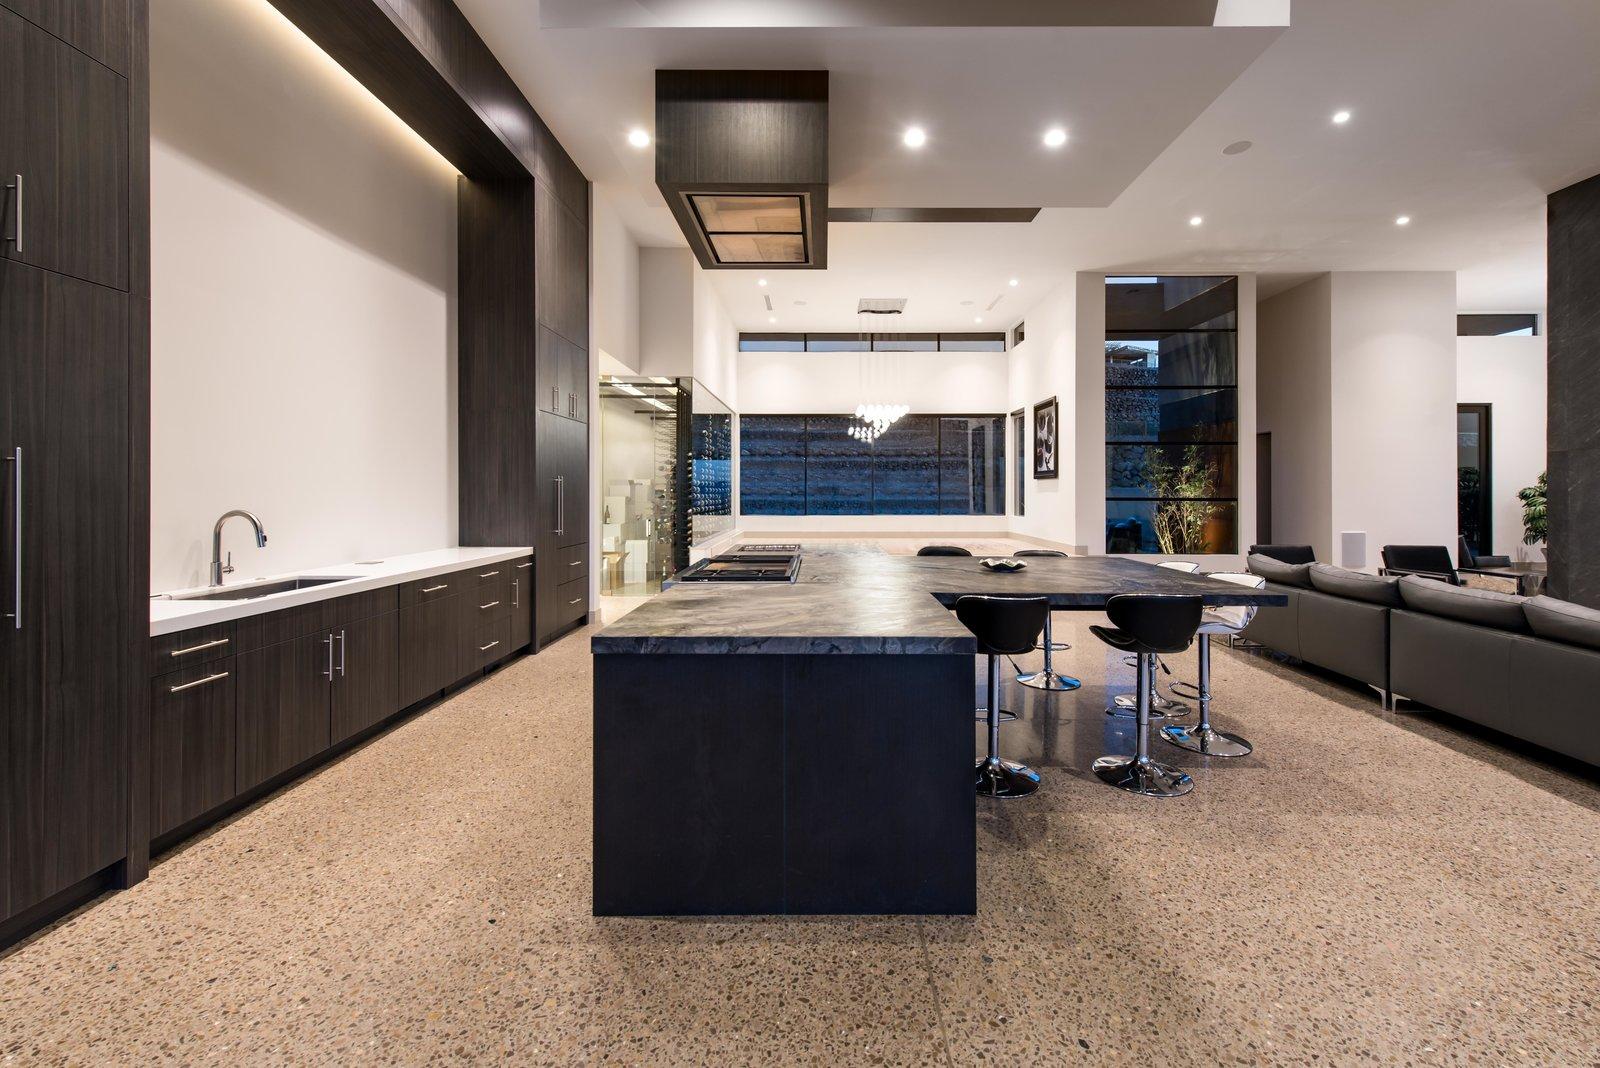 Kitchen, Wood Cabinet, Undermount Sink, Ceiling Lighting, Limestone Floor, Granite Counter, and Refrigerator kitchen   Cloud Chaser